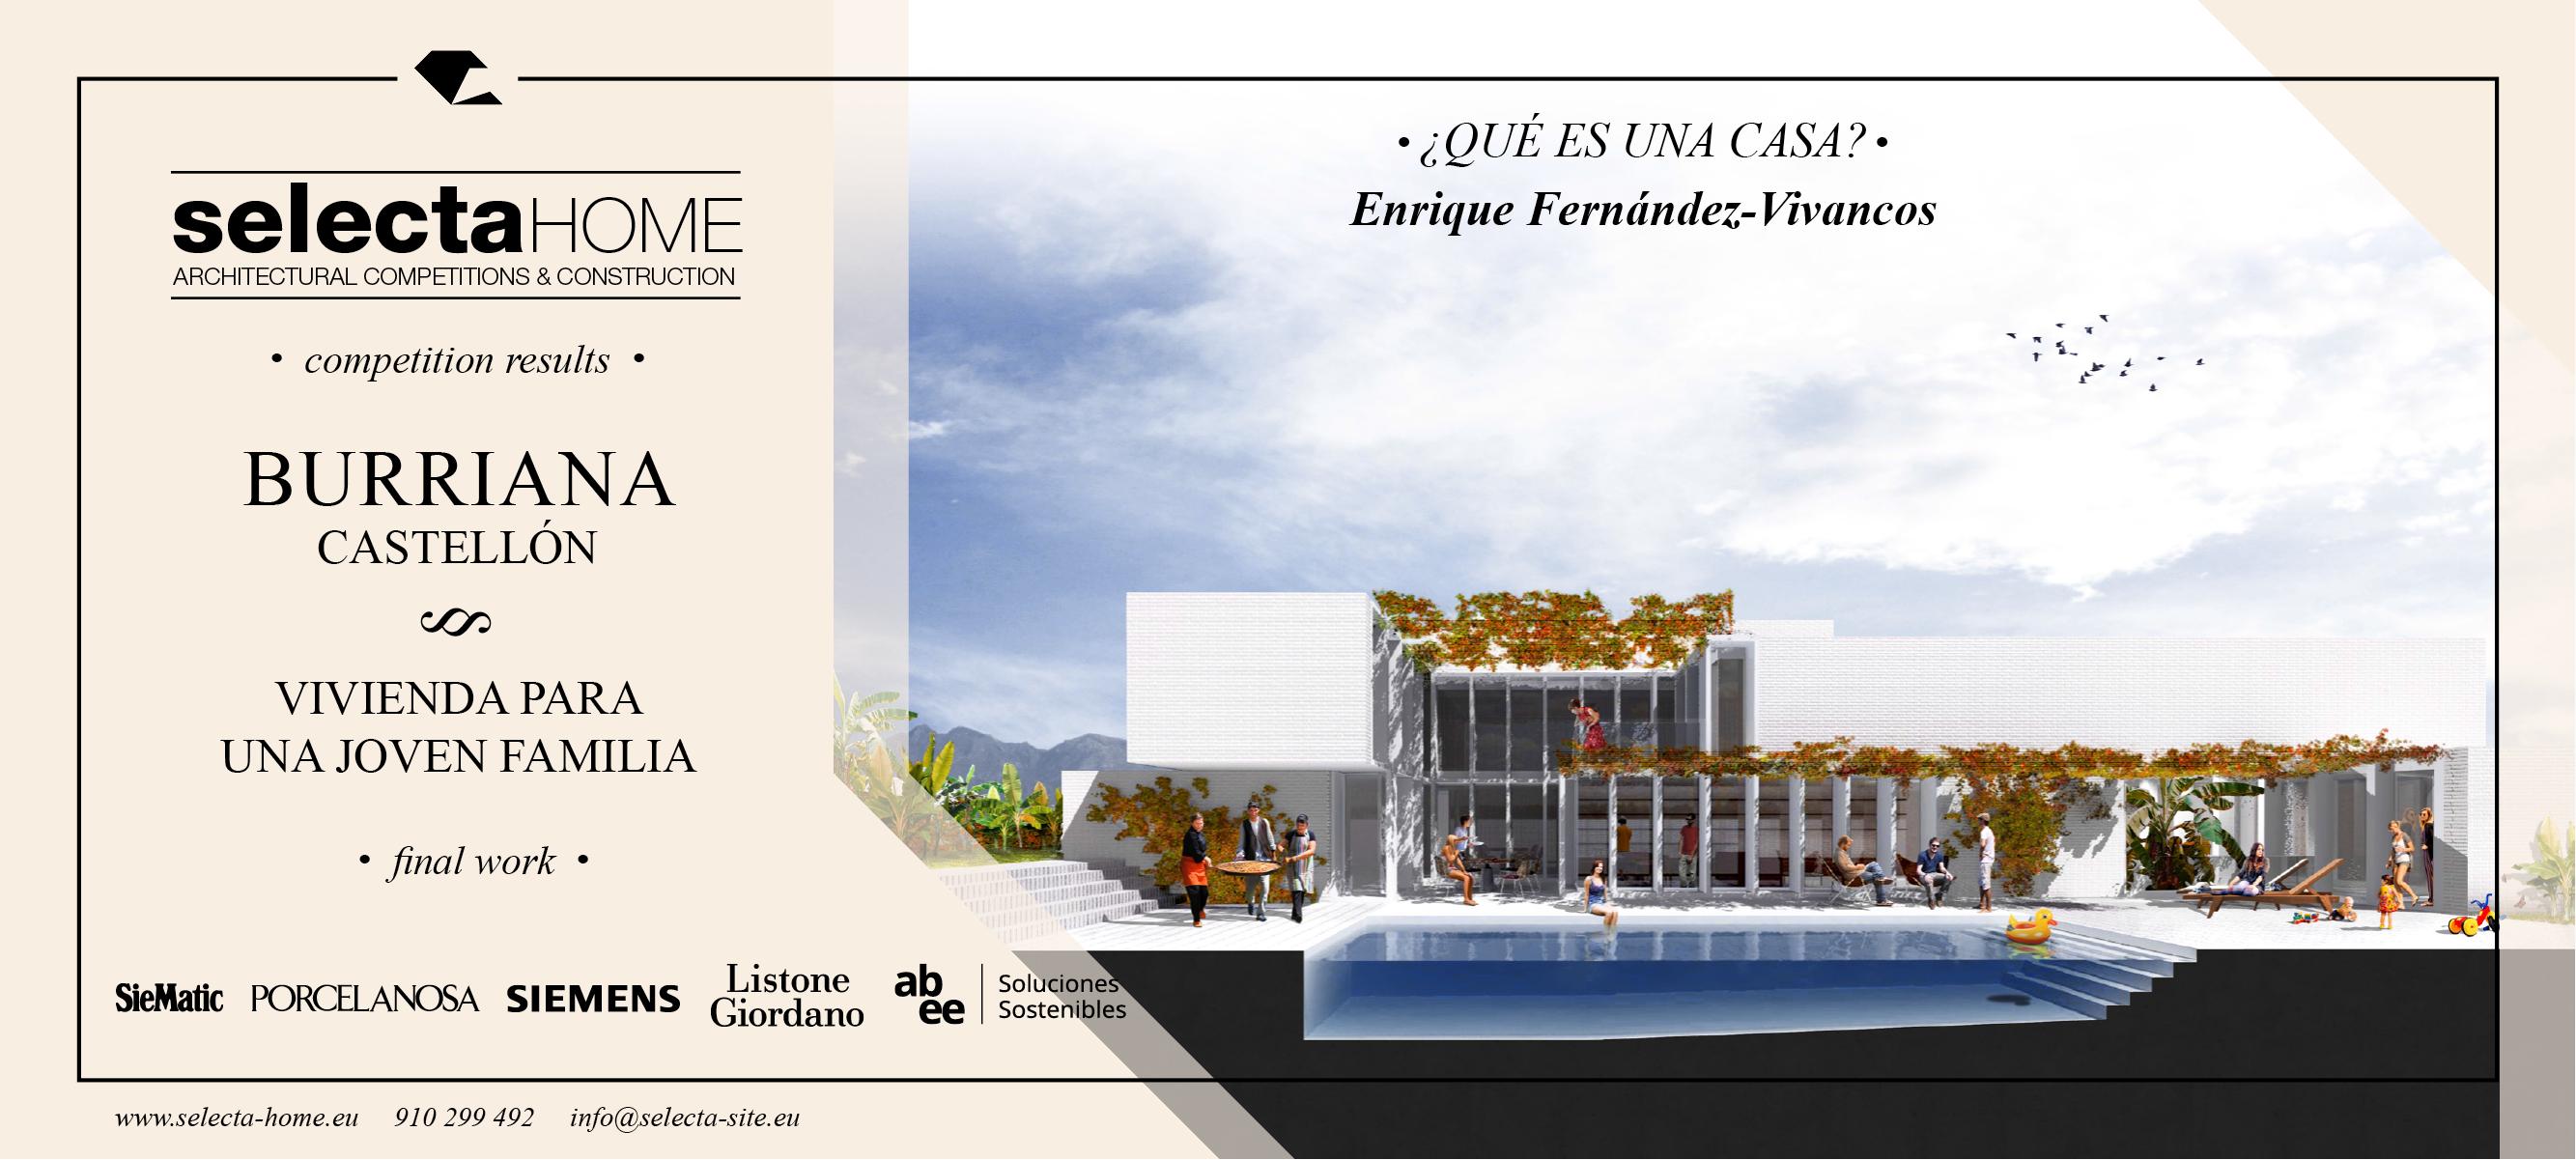 proyecto-burriana